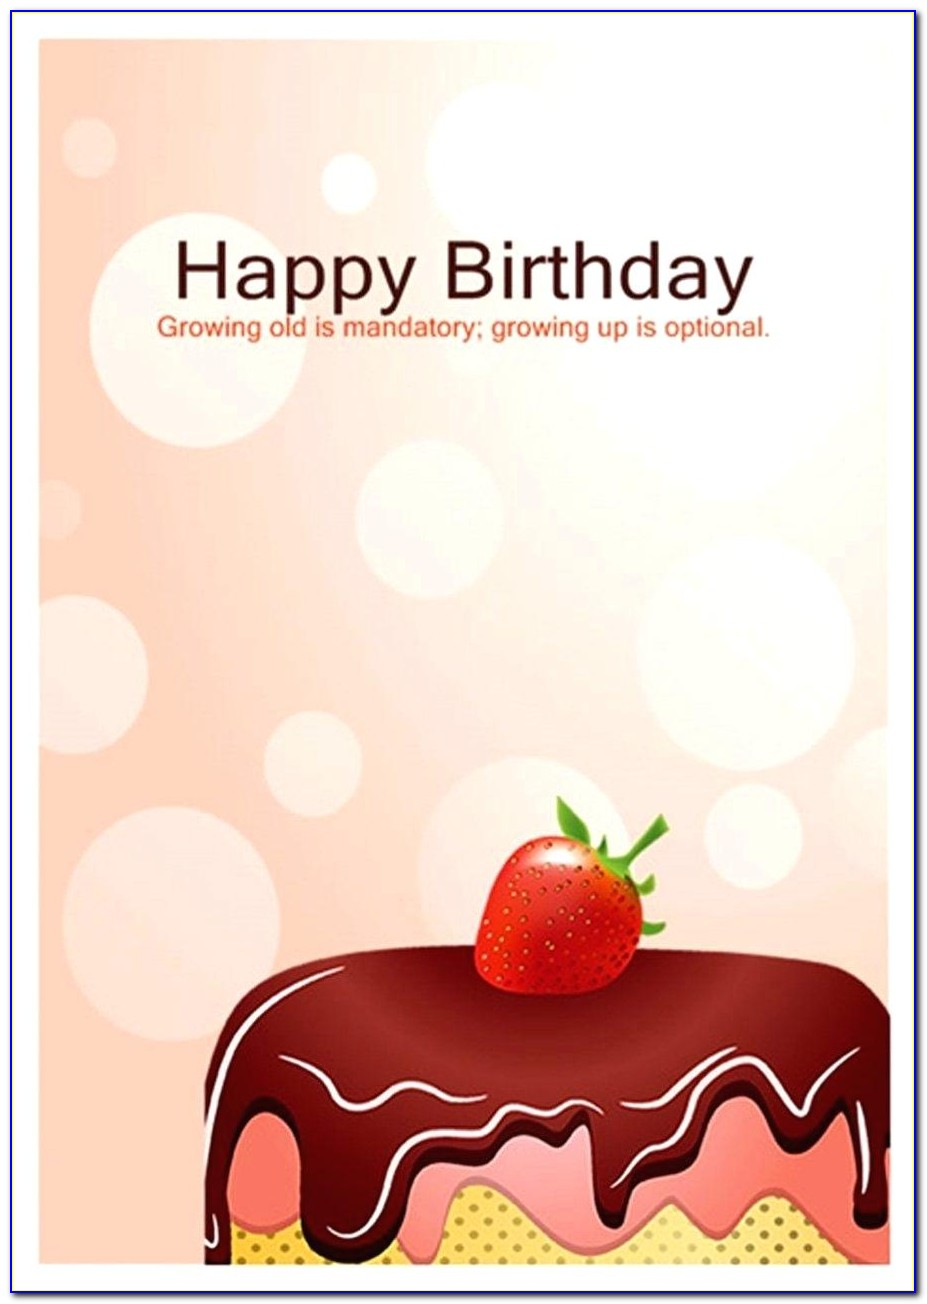 Free Birthday Ecard Templates